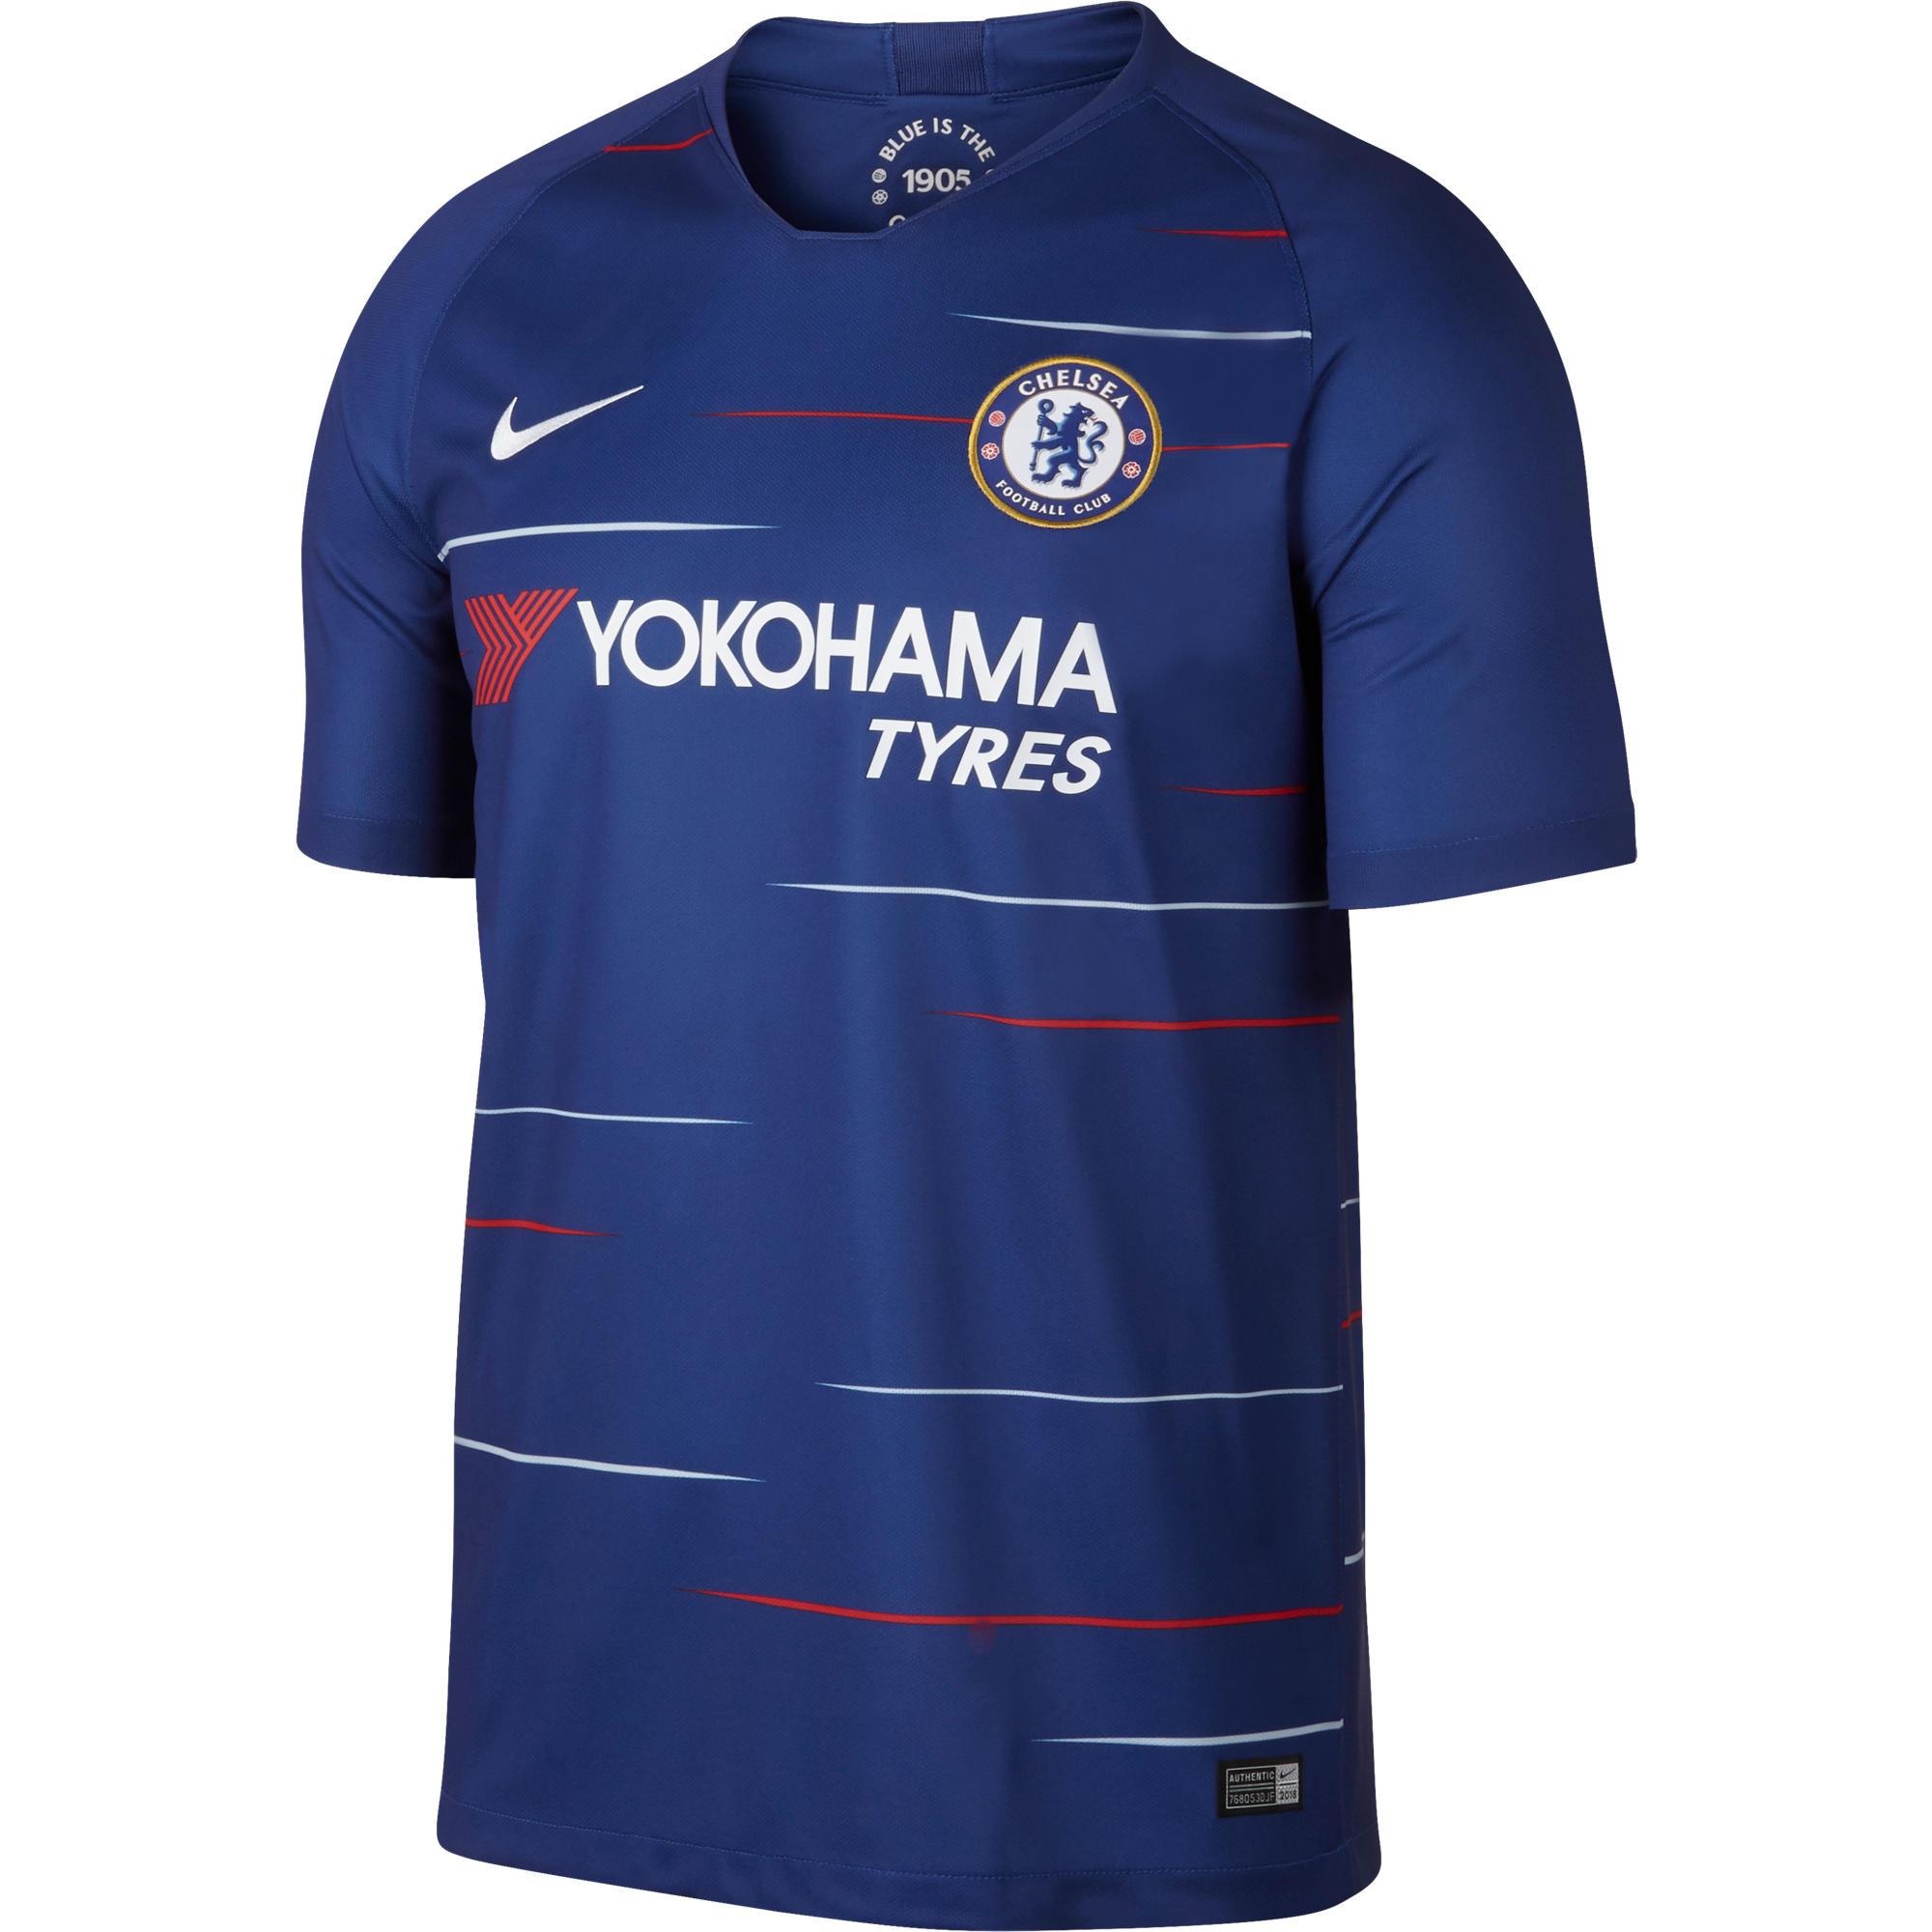 Camiseta de Fútbol Nike oficial Chelsea 1ª equipación hombre 2018 19 2cea9229c4078